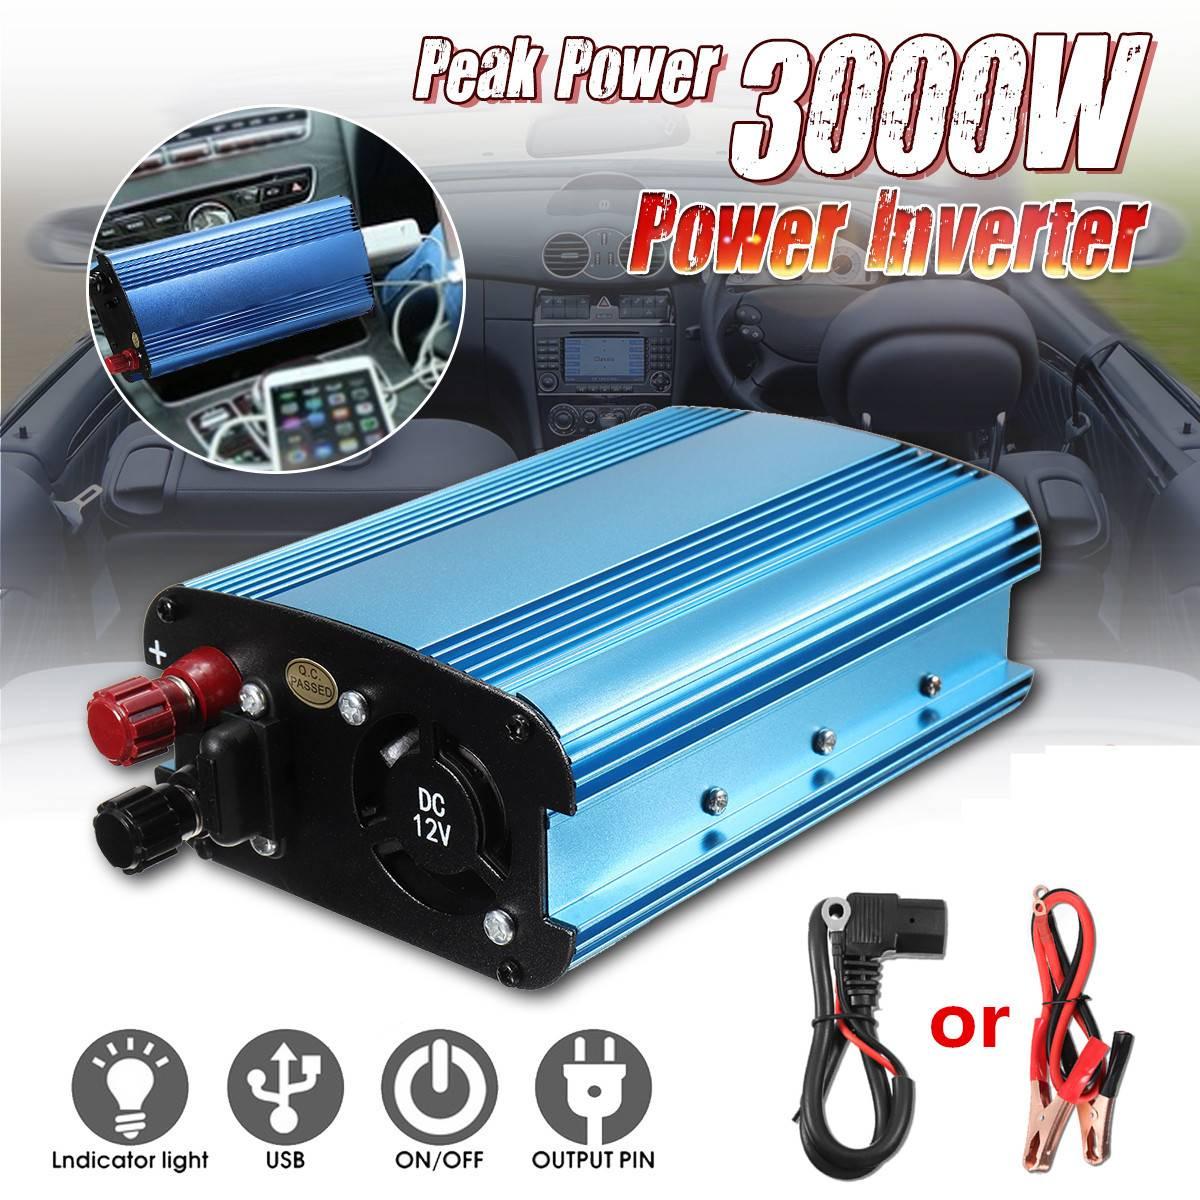 Solar Inverter 12V 24V 48V 60V 500W 3000W Pe ak Power Inverter Voltage Converter Transformer DC 12V AC 220V InversorSolar Inverter 12V 24V 48V 60V 500W 3000W Pe ak Power Inverter Voltage Converter Transformer DC 12V AC 220V Inversor